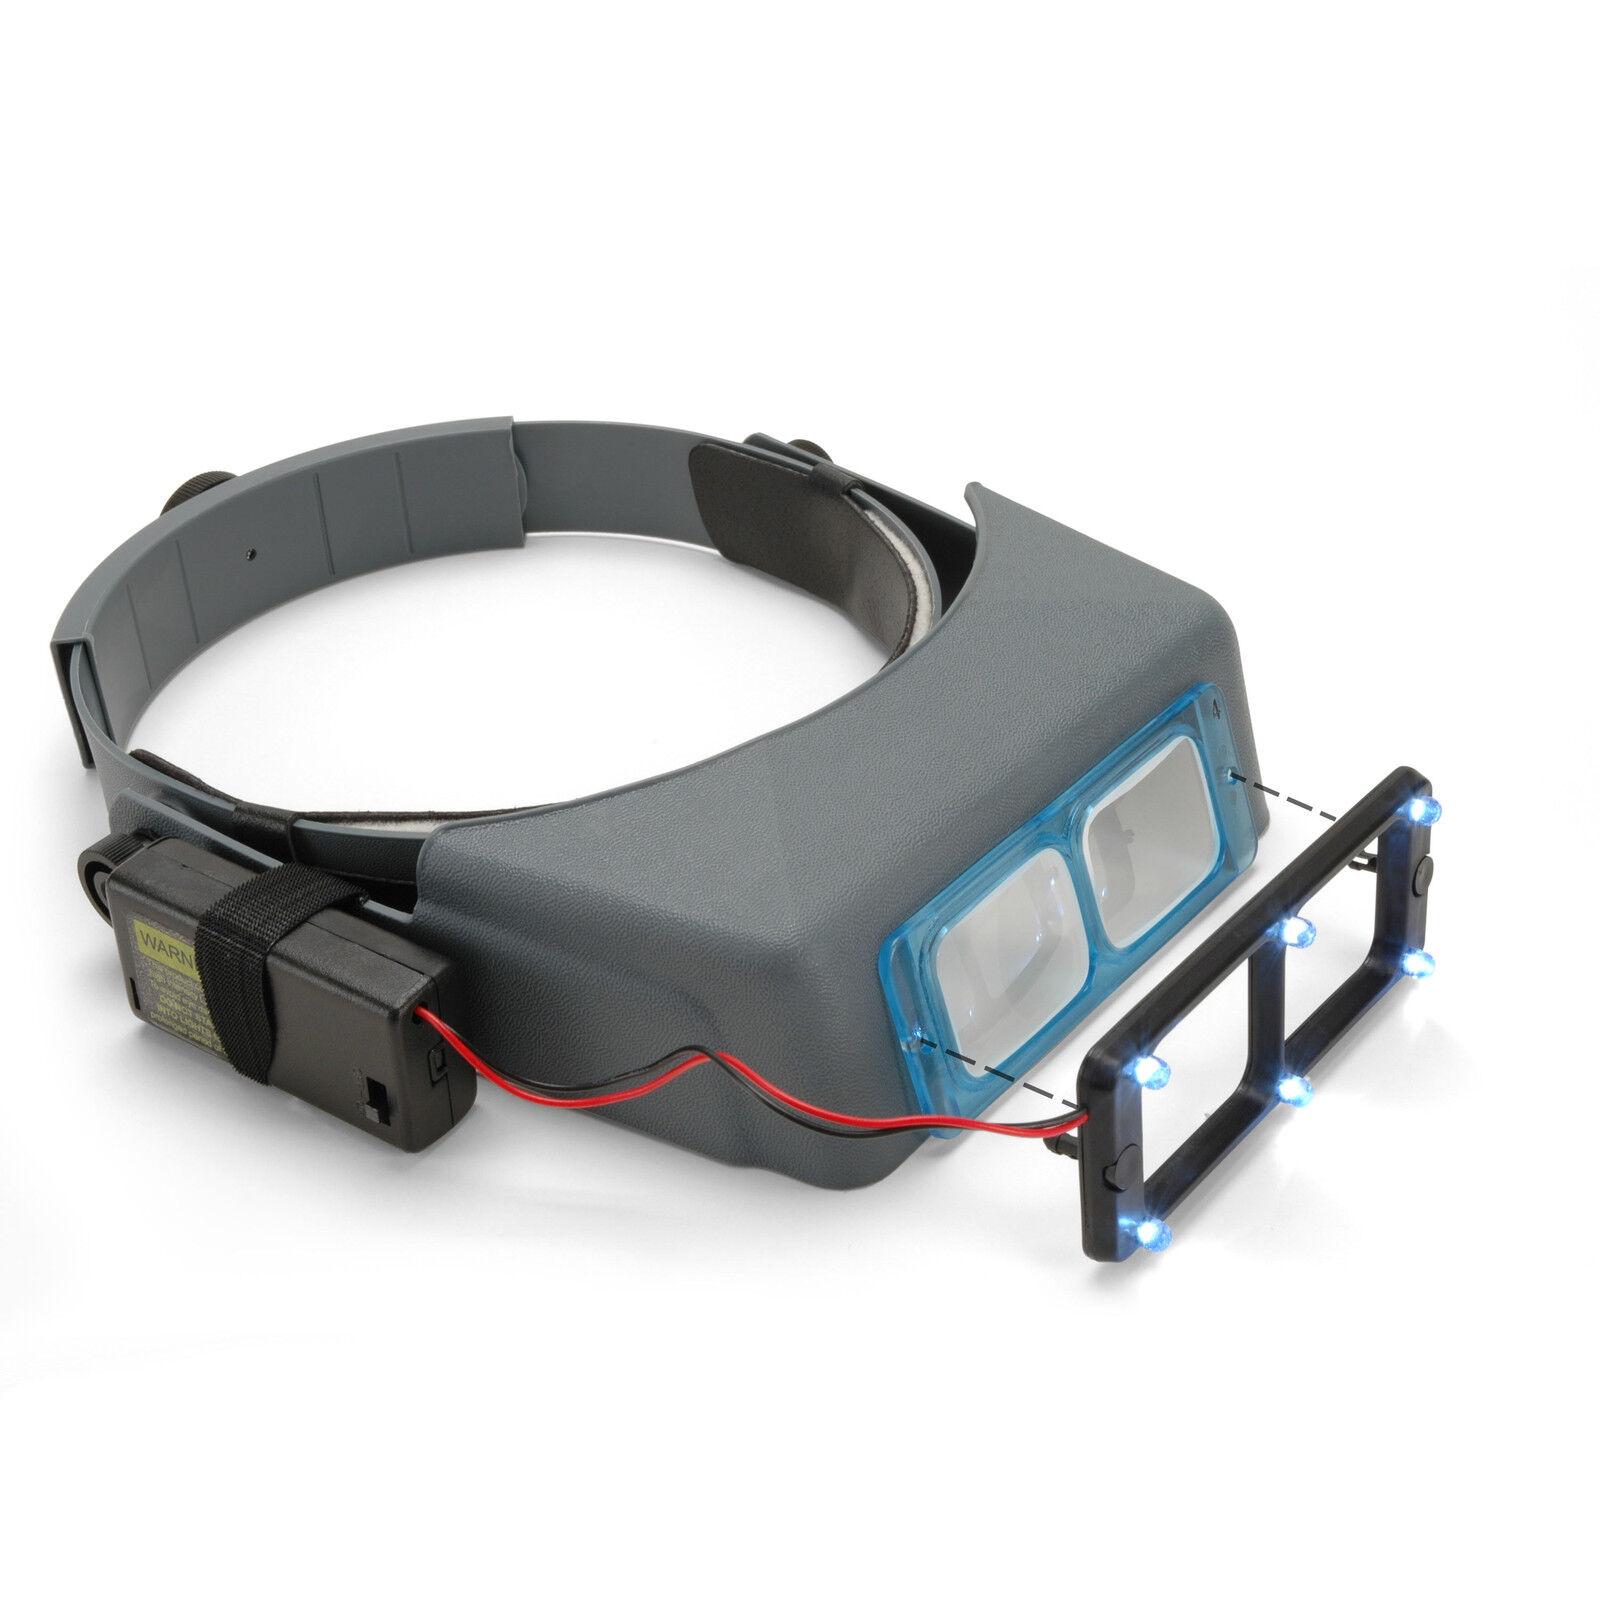 OptiVISOR Headband Magnifier, OptiVISOR Headband with Quasar LS Lights